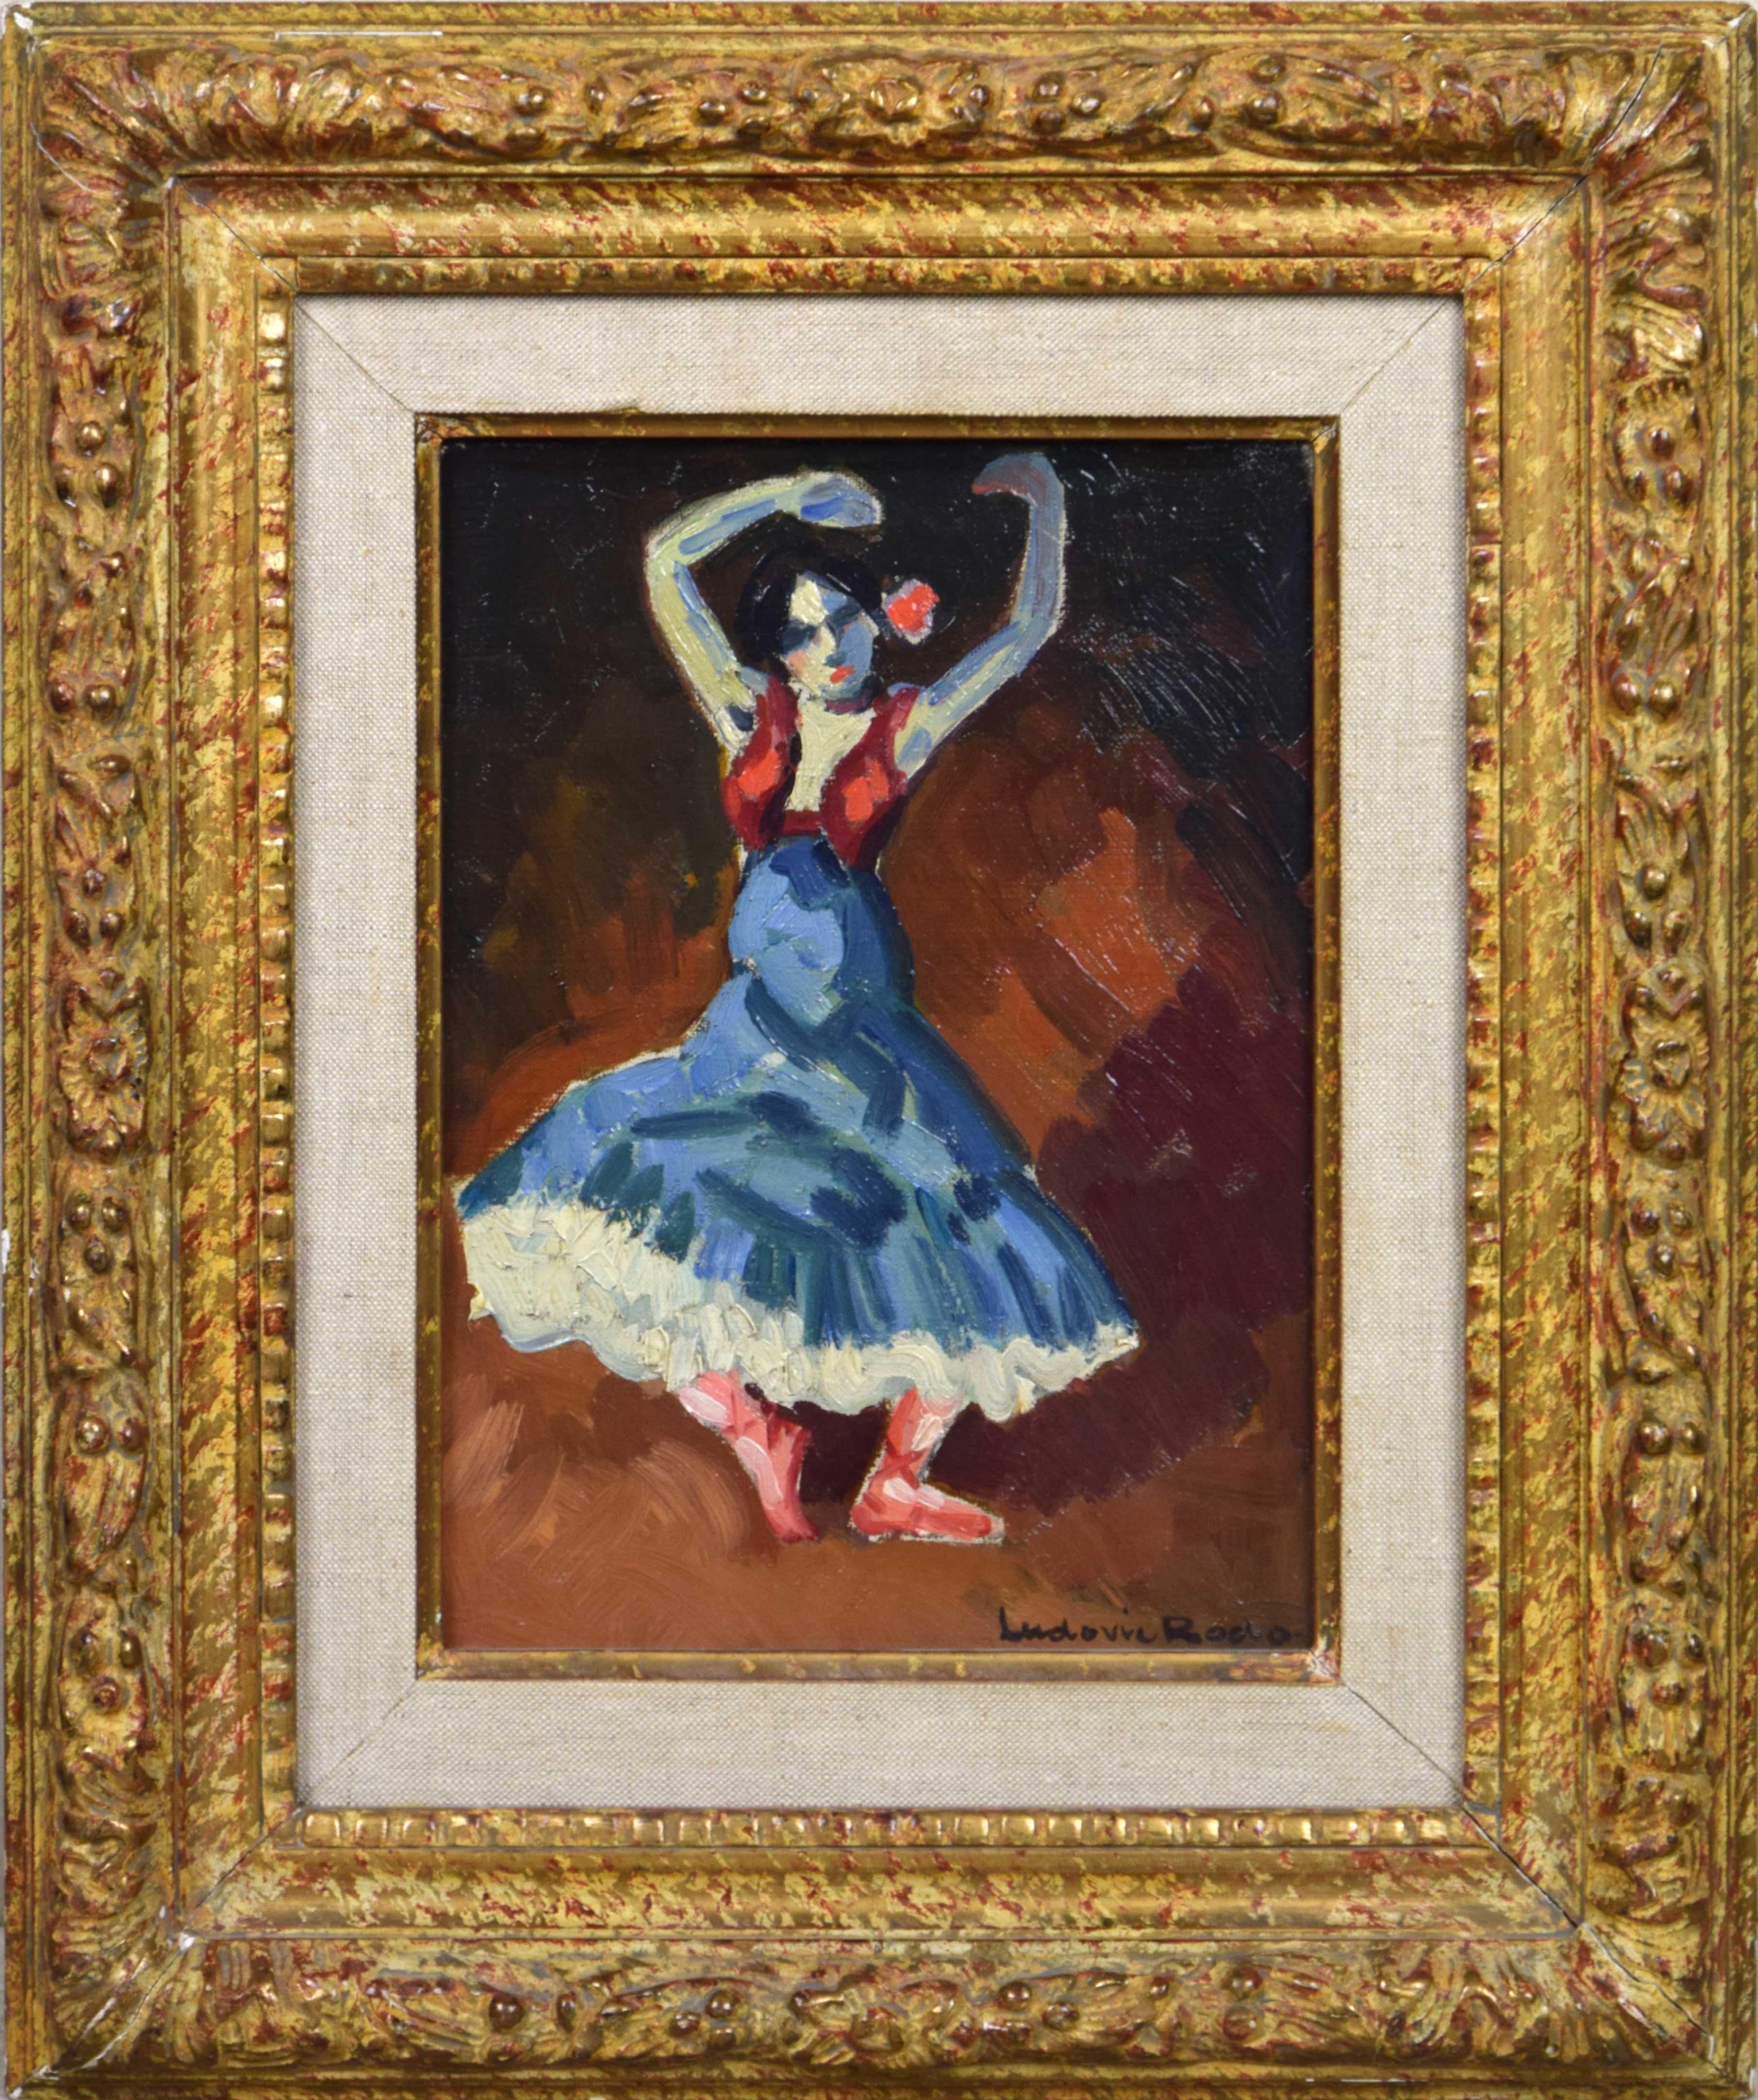 Danseuse Espagnole by LUDOVIC RODO PISSARRO - Fauvist Painting of Spanish Dancer